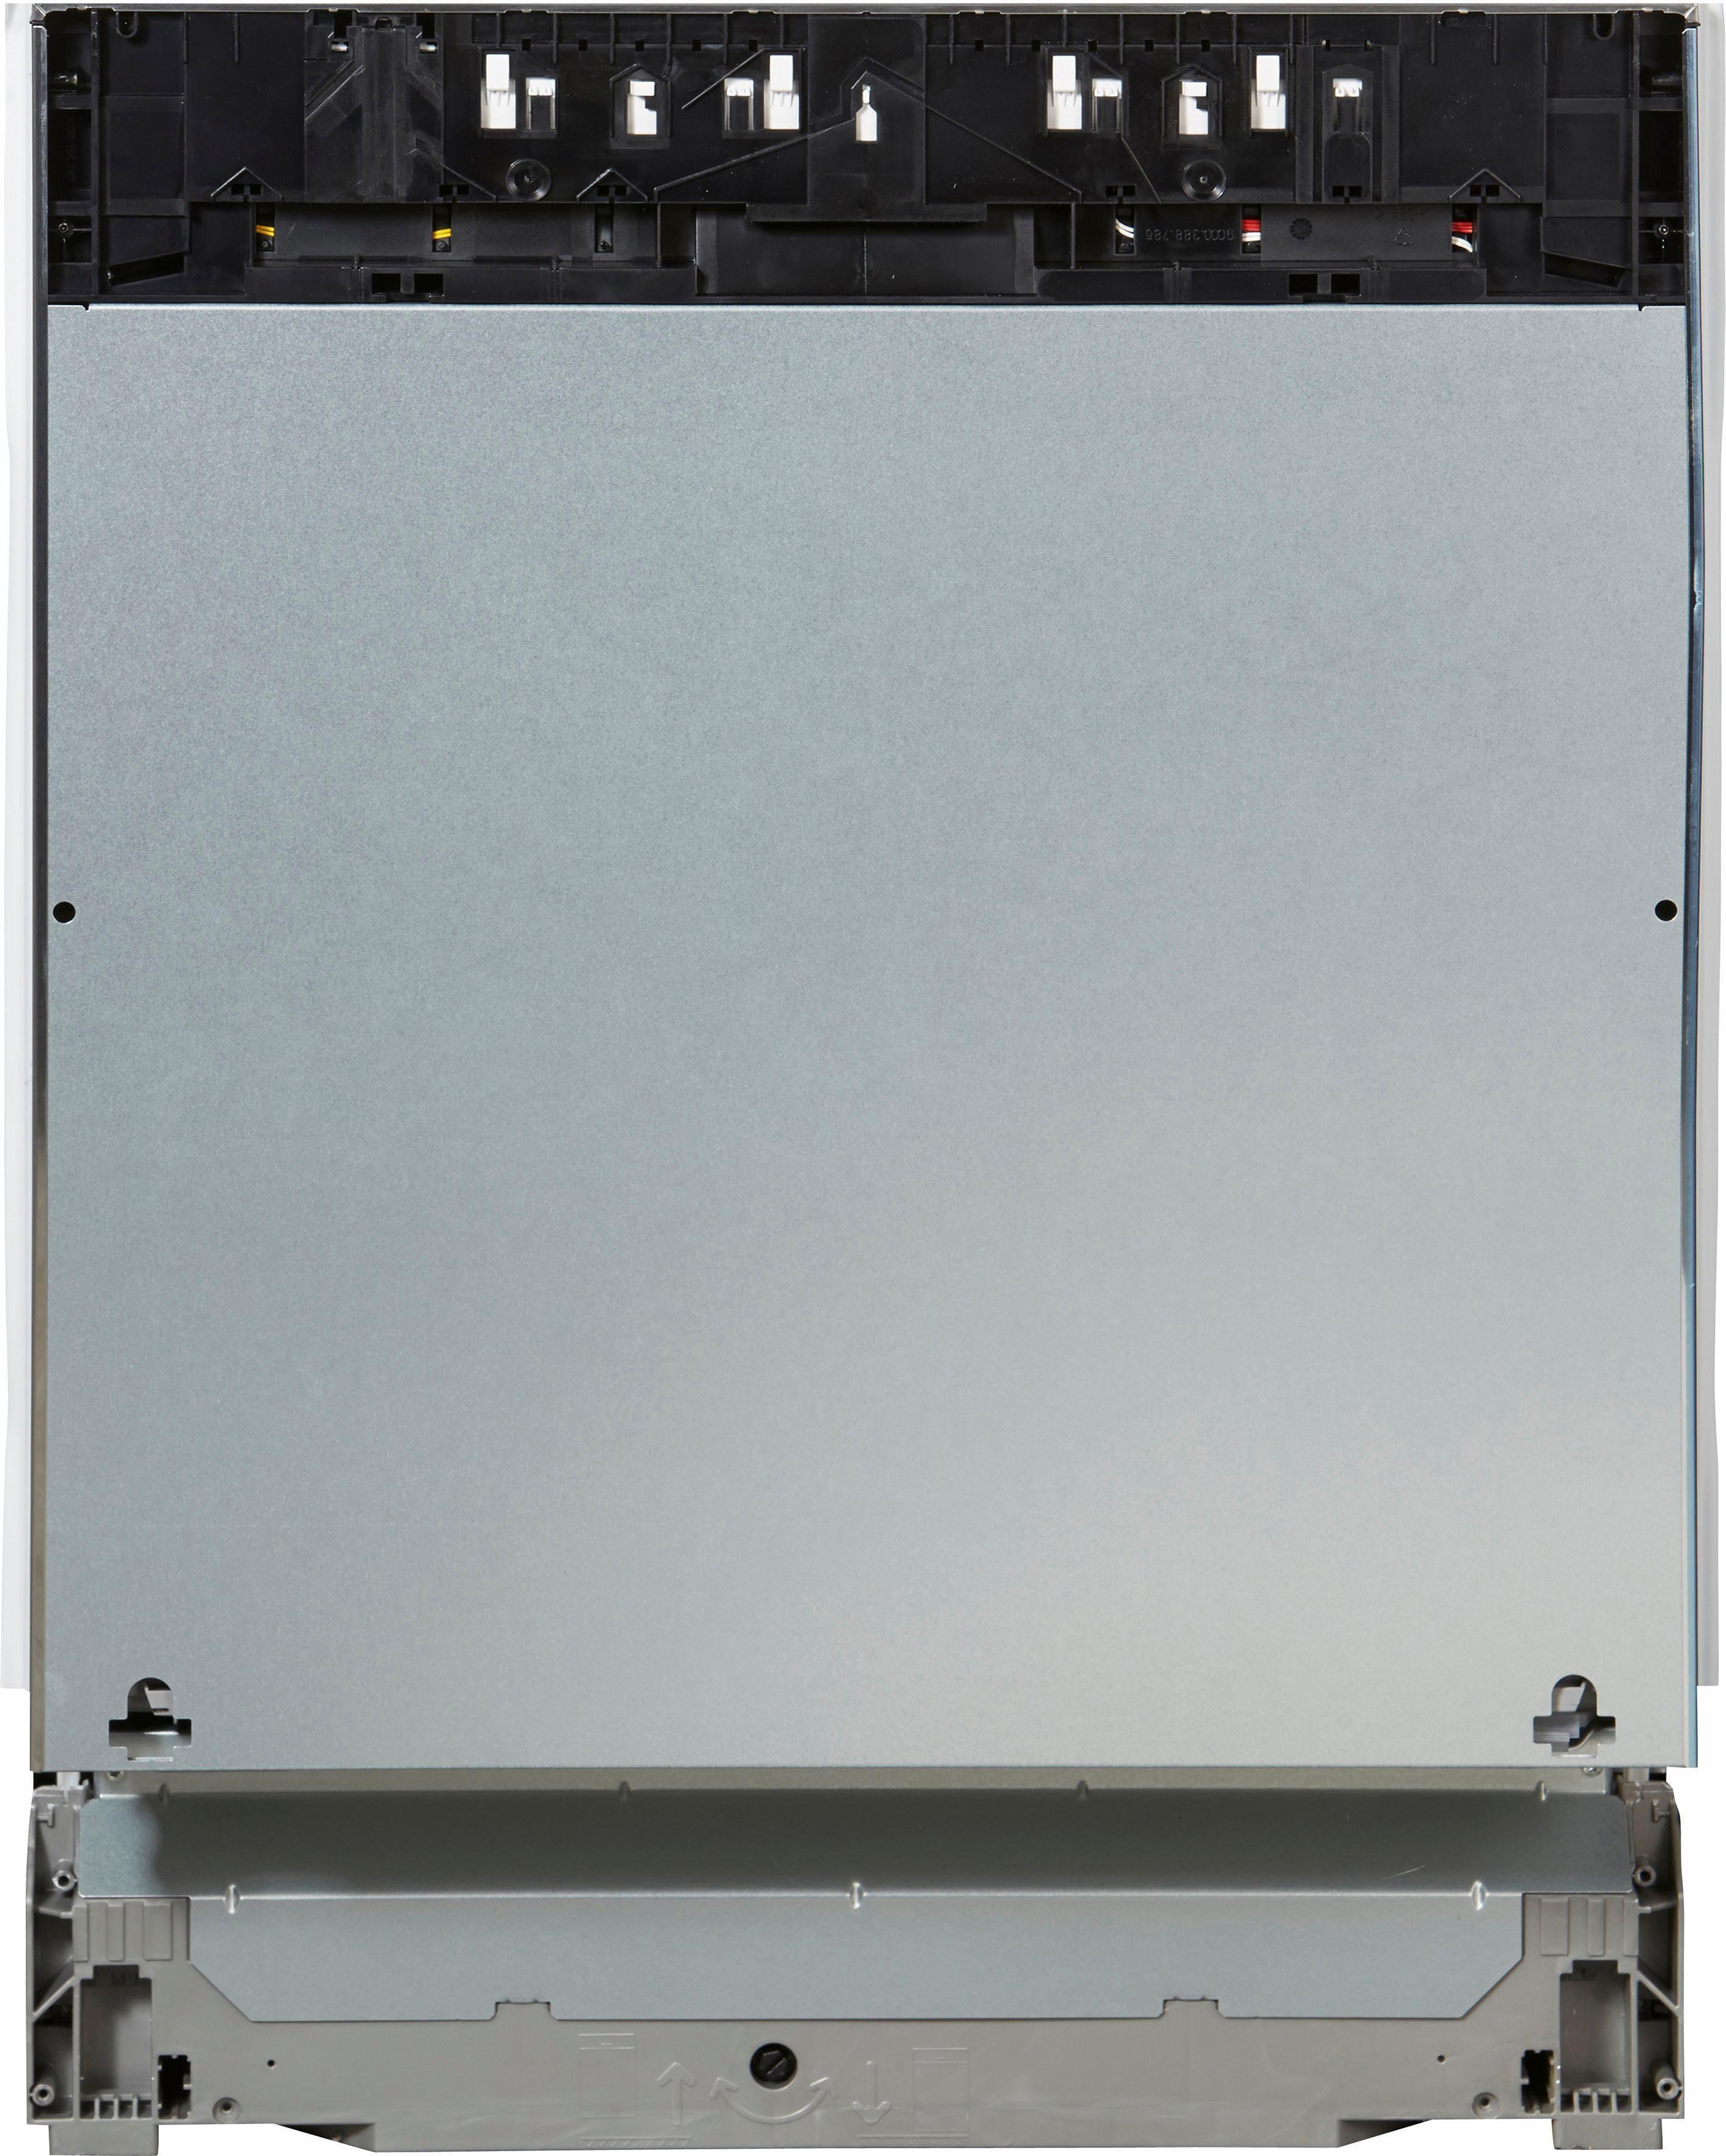 SIEMENS vollintegrierbarer Geschirrspüler iQ300, iQ300 SN636X00EE, 9,5 l, 13 Maßgedecke